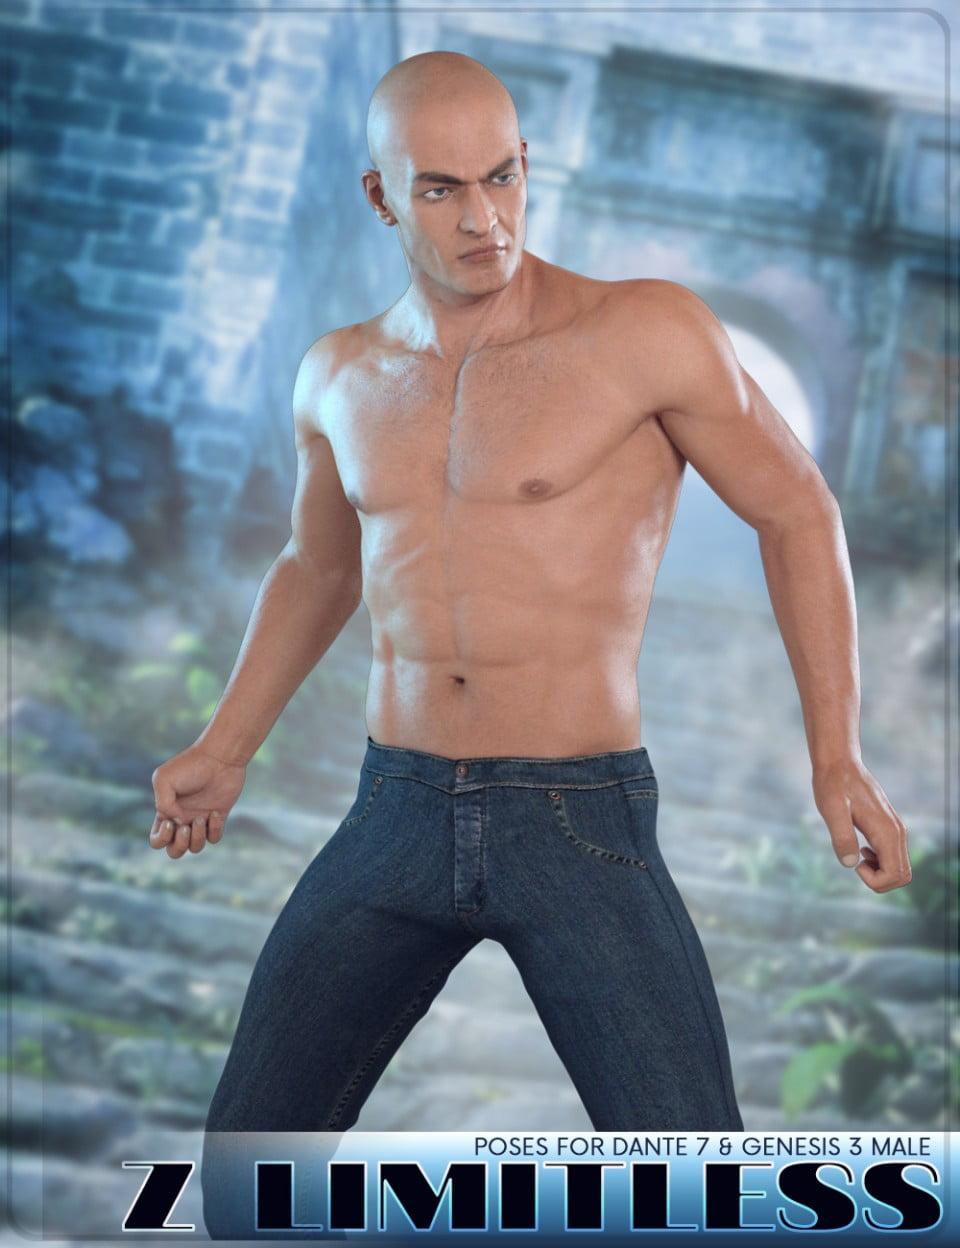 Z Limitless - Poses for Dante 7 and Genesis 3 Male - poses, daz-poser-carrara